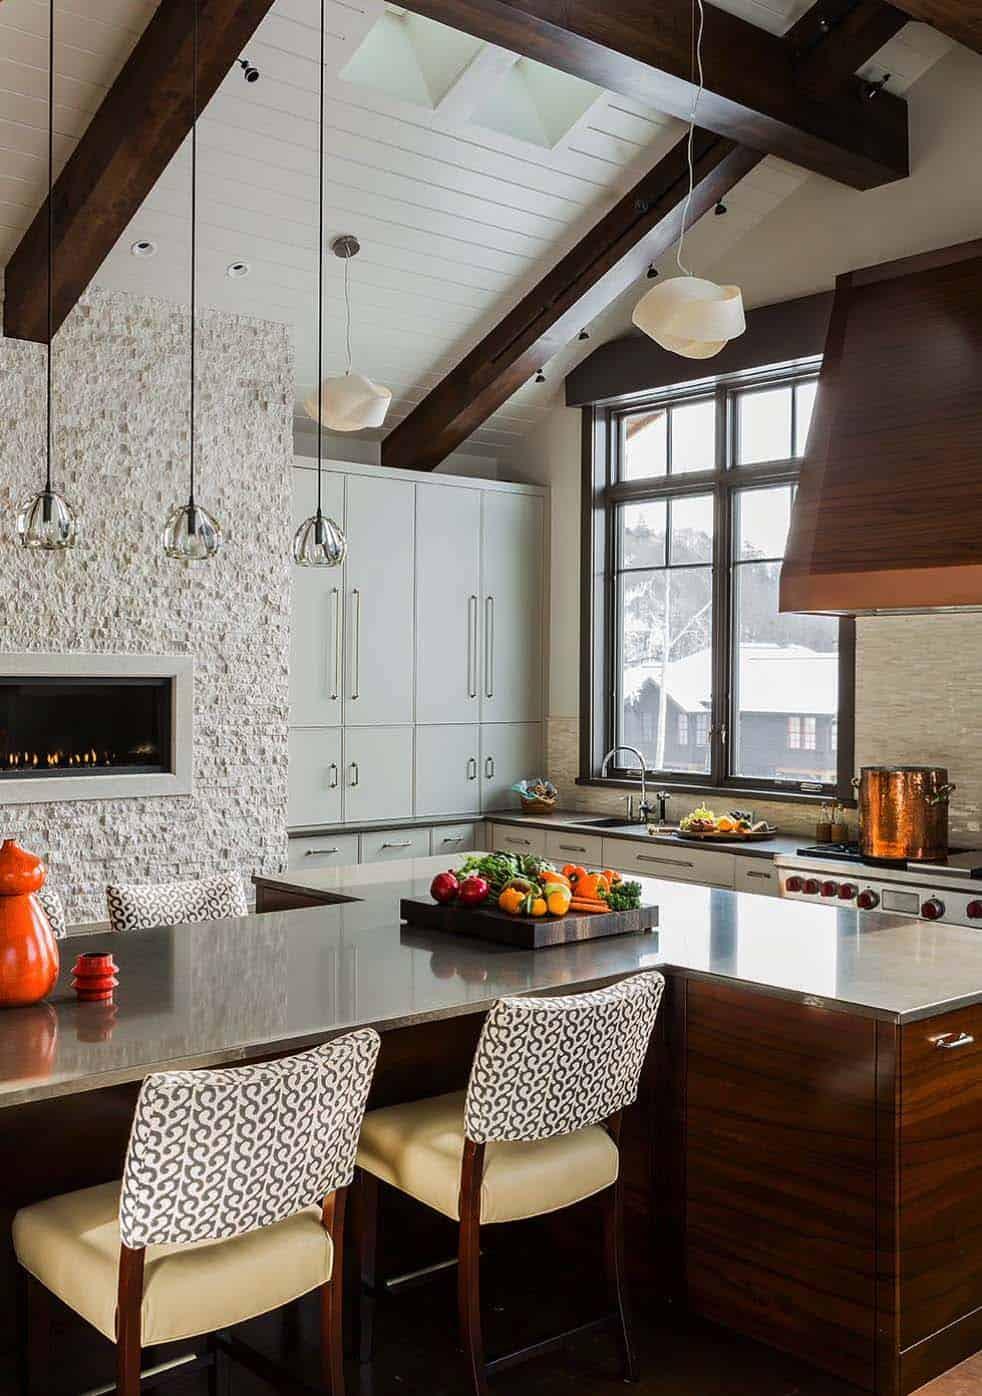 Kitchen Showcasing Cozy Fireplace-06-1 Kindesign